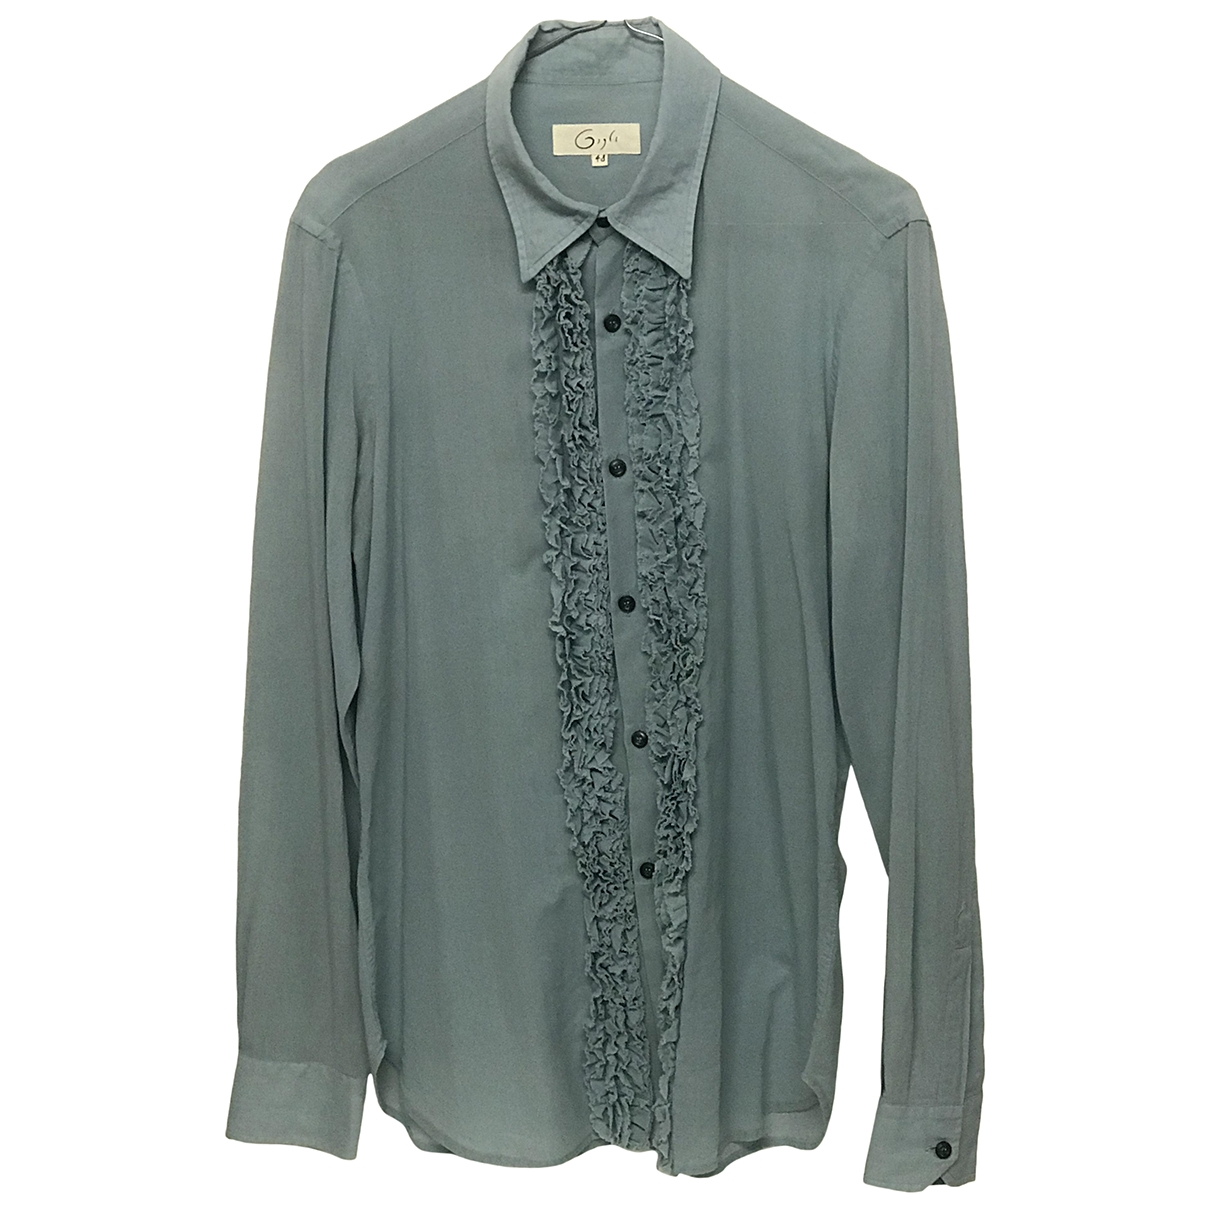 Romeo Gigli \N Turquoise Cotton Shirts for Men M International